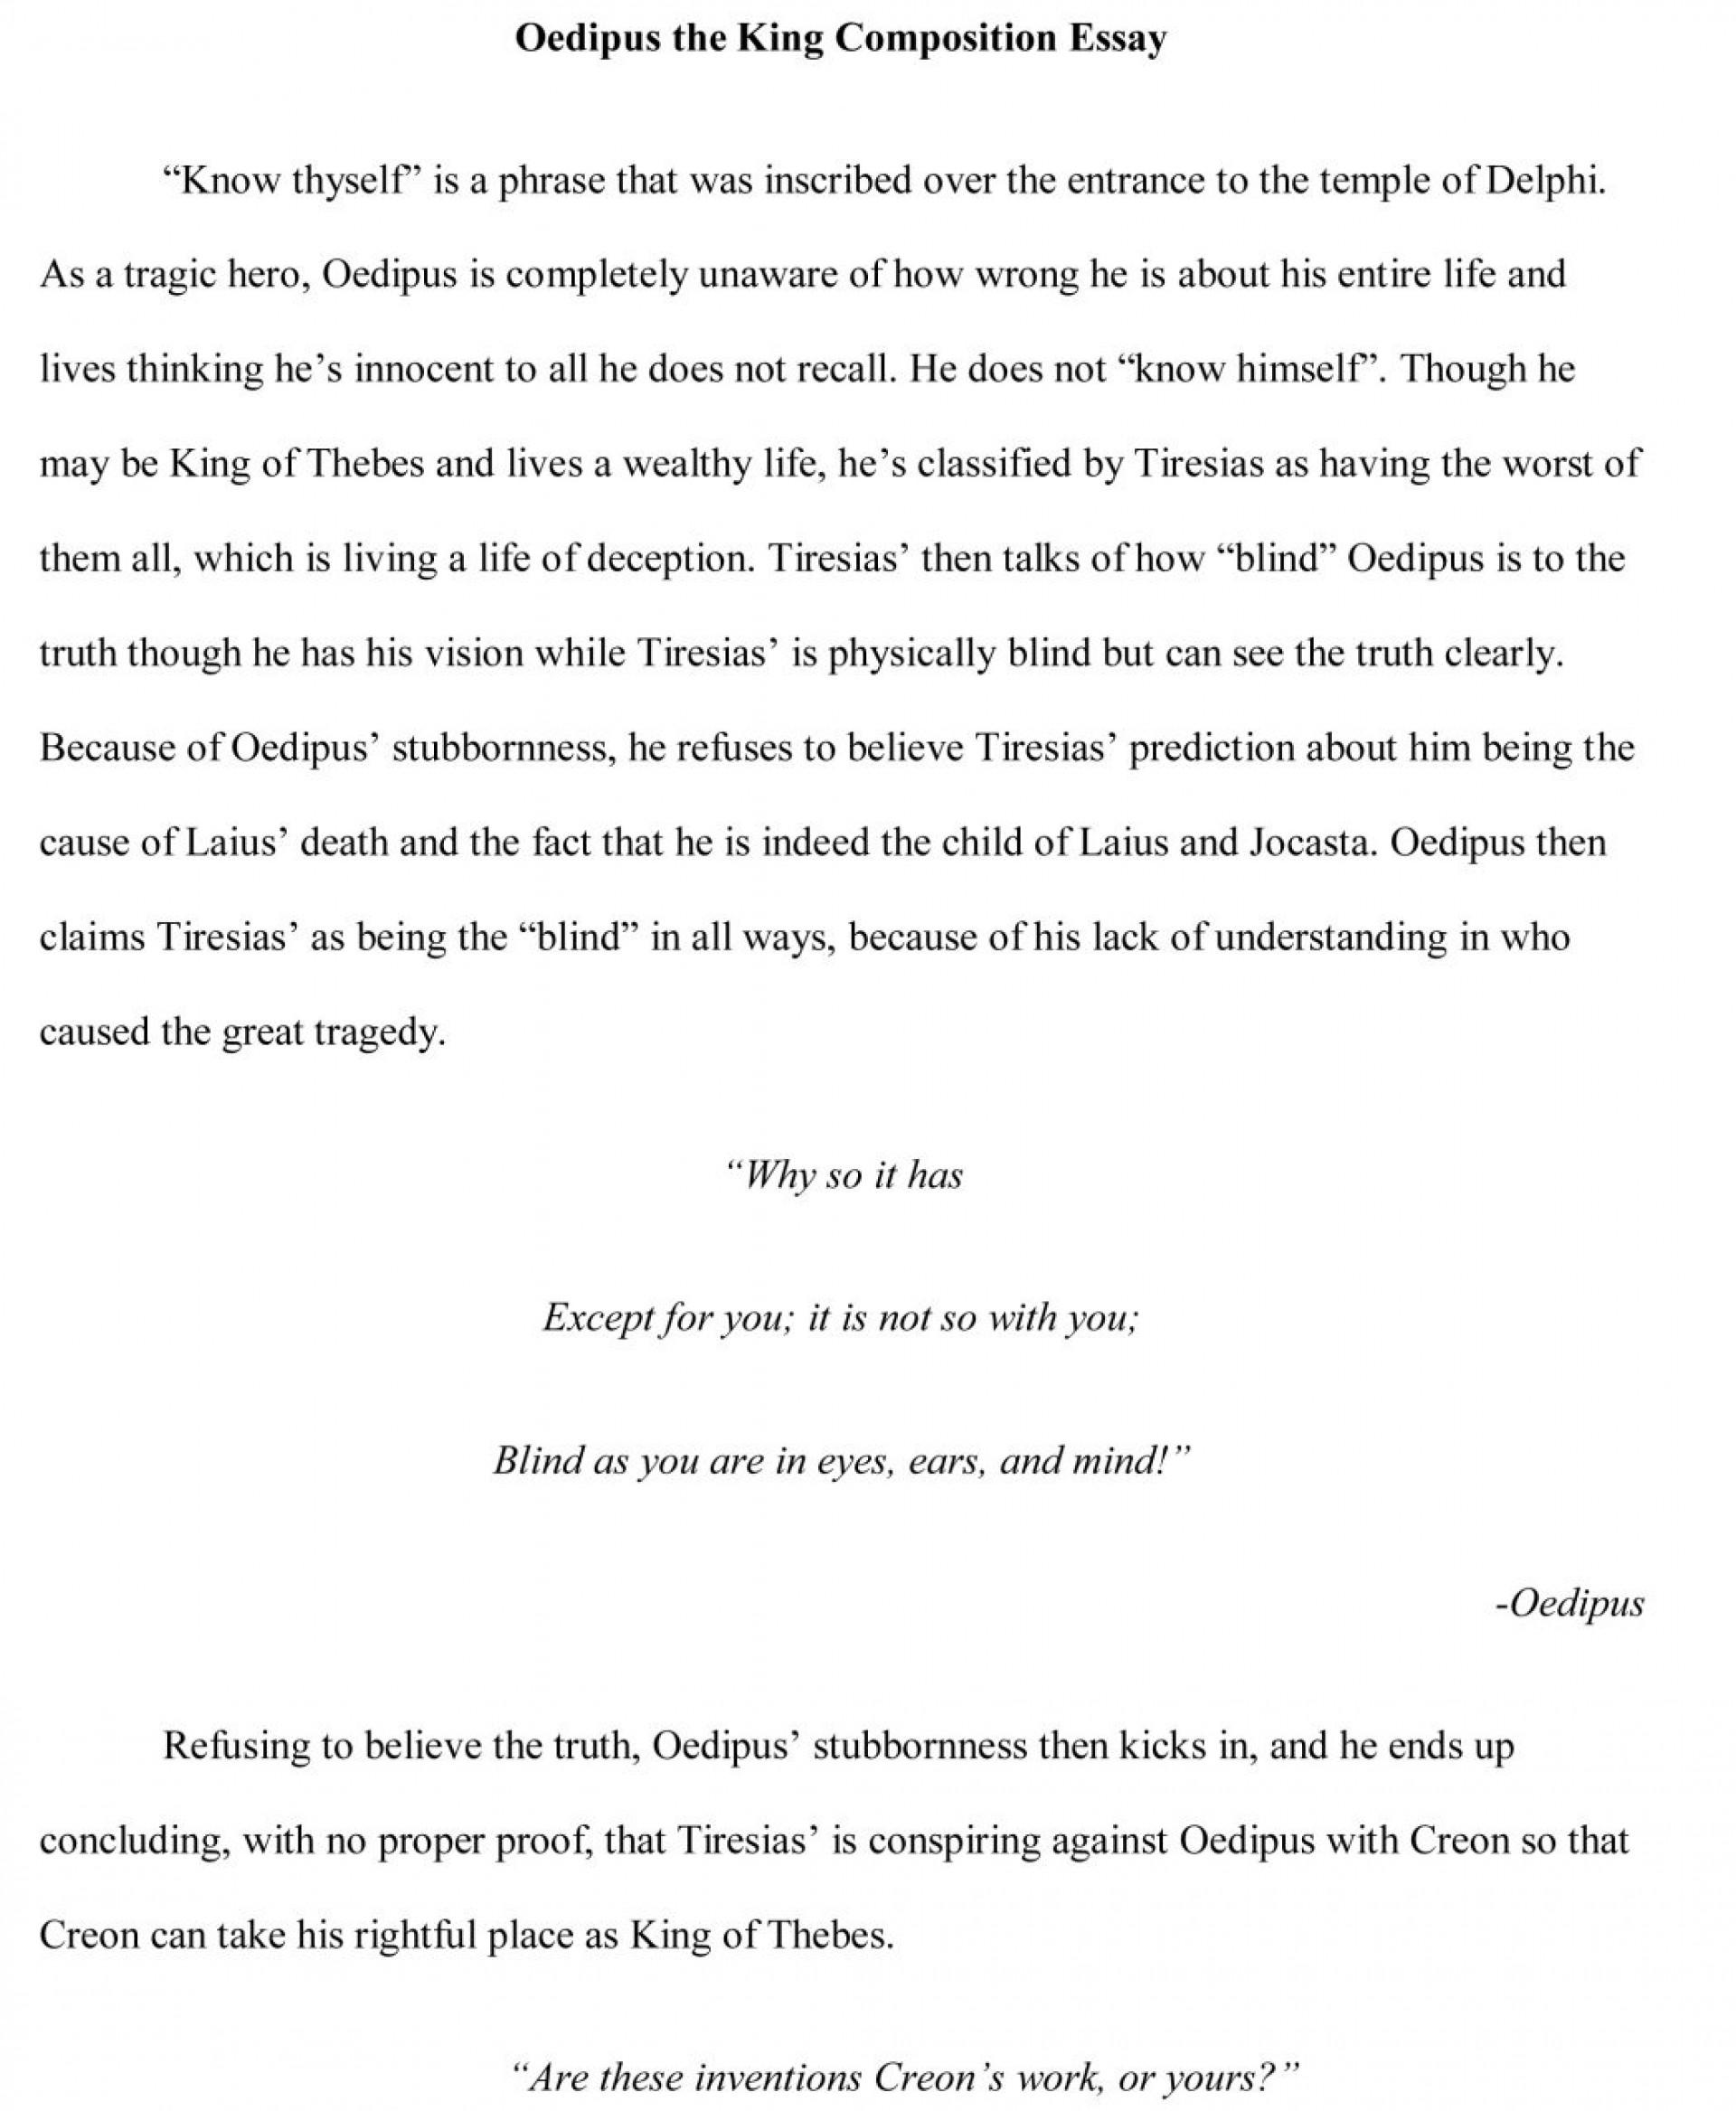 verbal bullying essay senia s school paper simply on prevent how    verbal bullying essay senia s school paper simply on prevent how to  in spm at